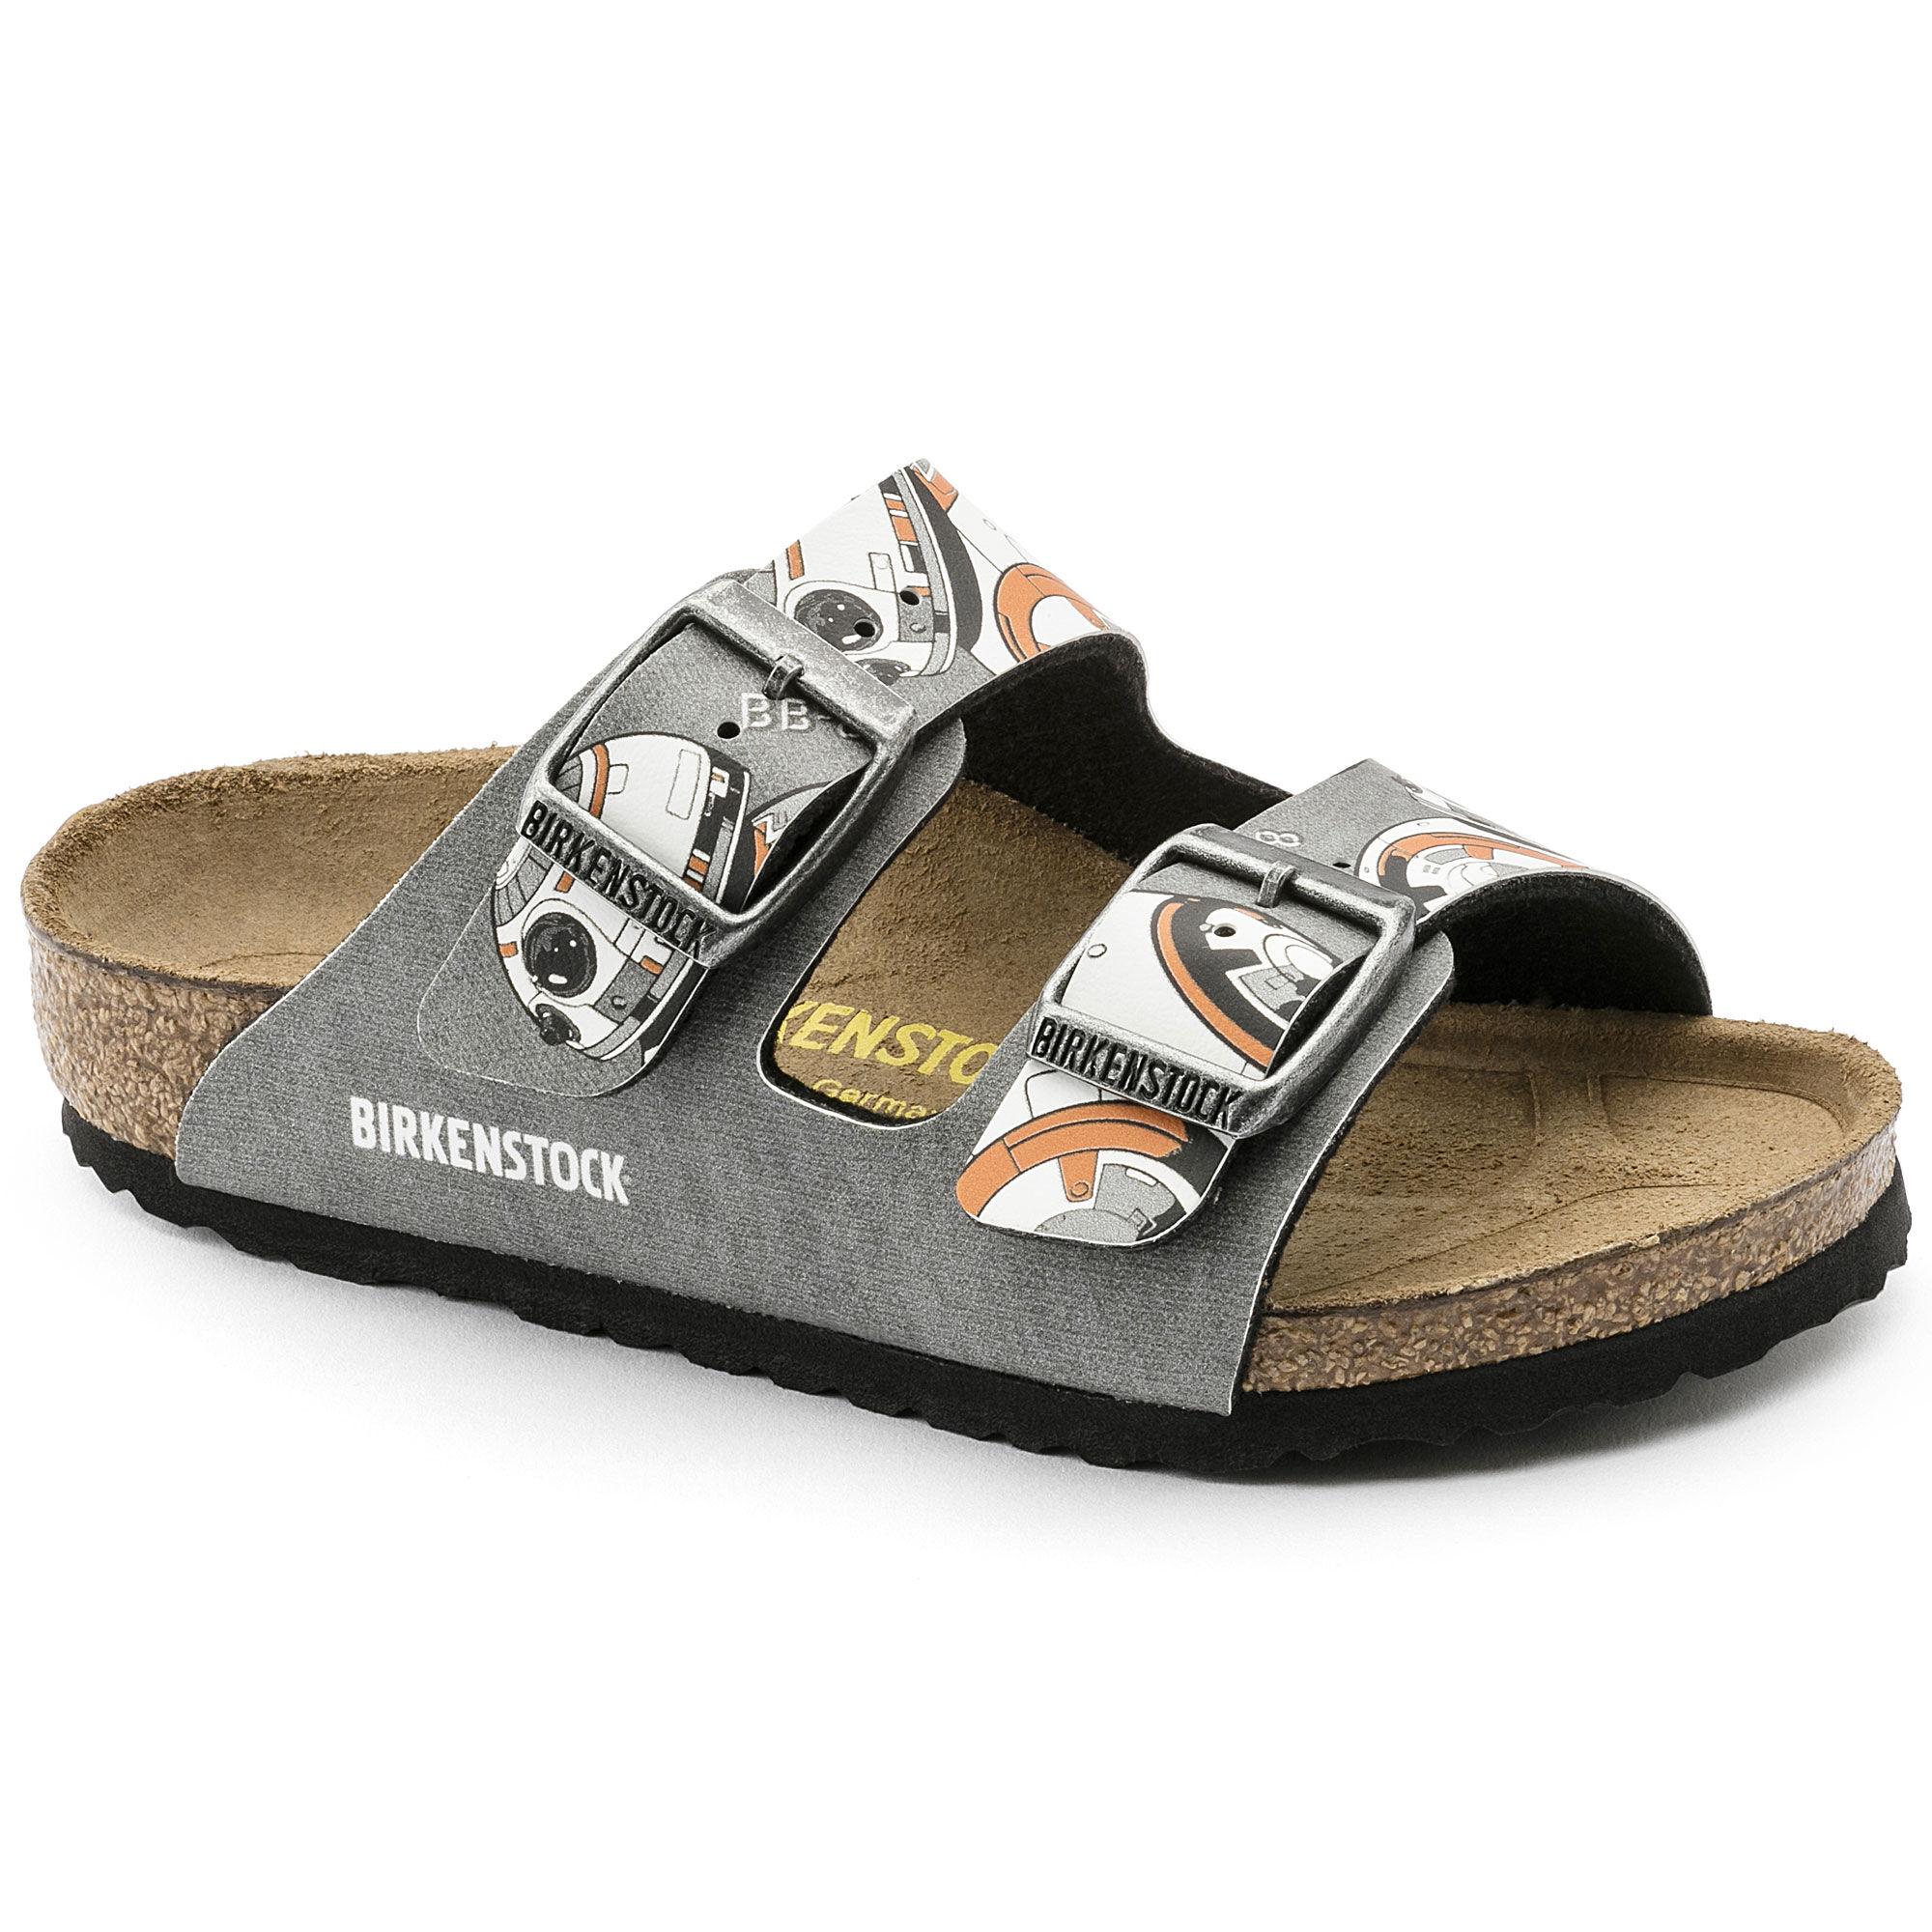 Birkenstock Pantolette Arizona city camo gray BF Gr. 26 - 34 1003329k aIY1yizbel